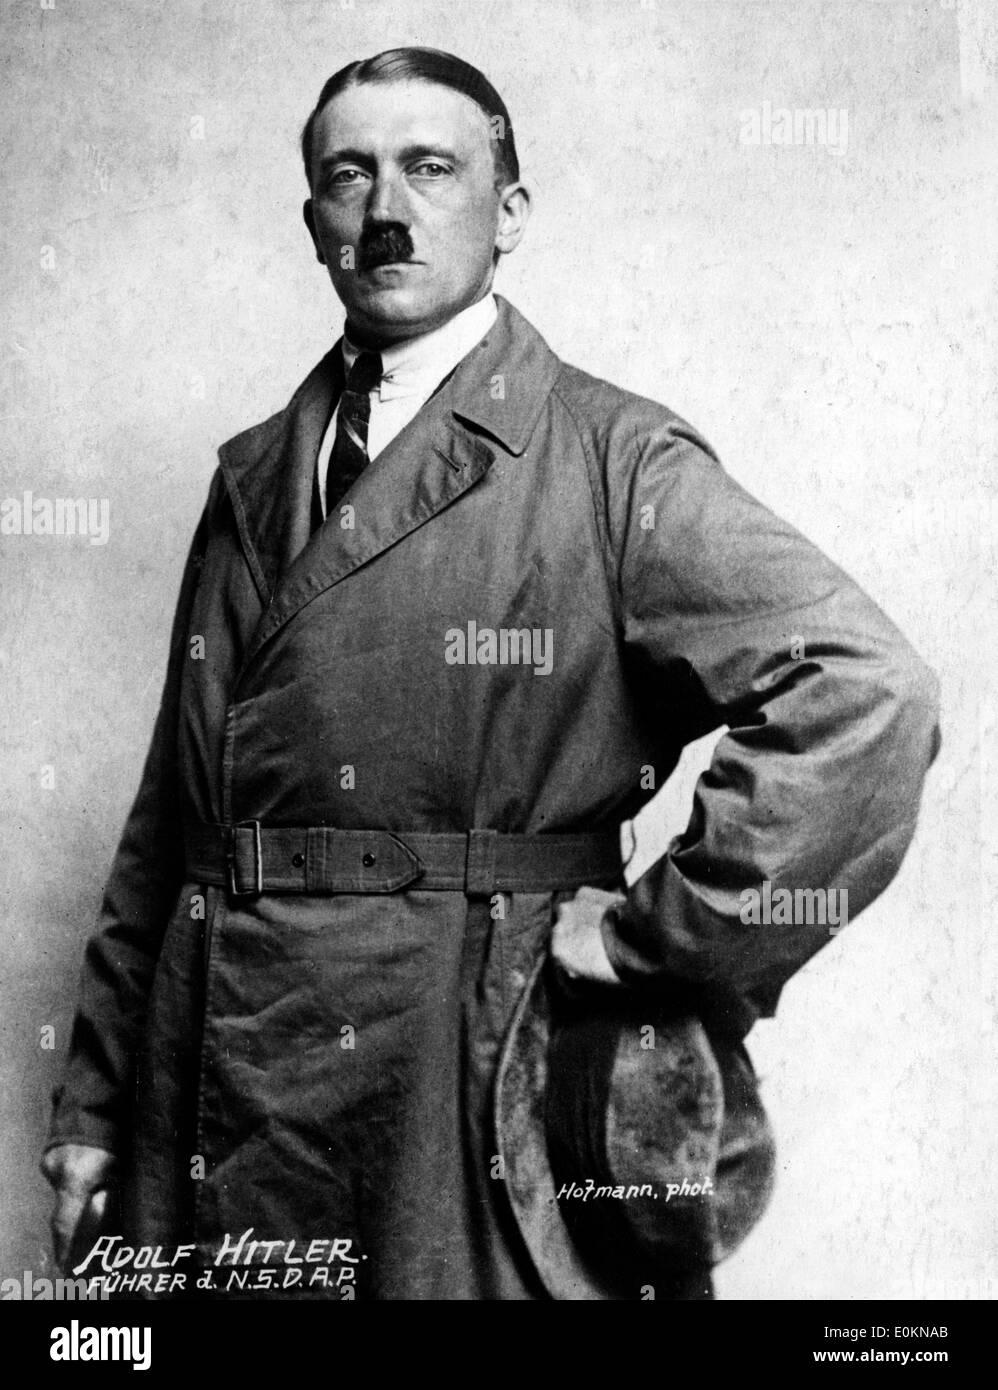 Original portrait of Adolf Hitler - Stock Image